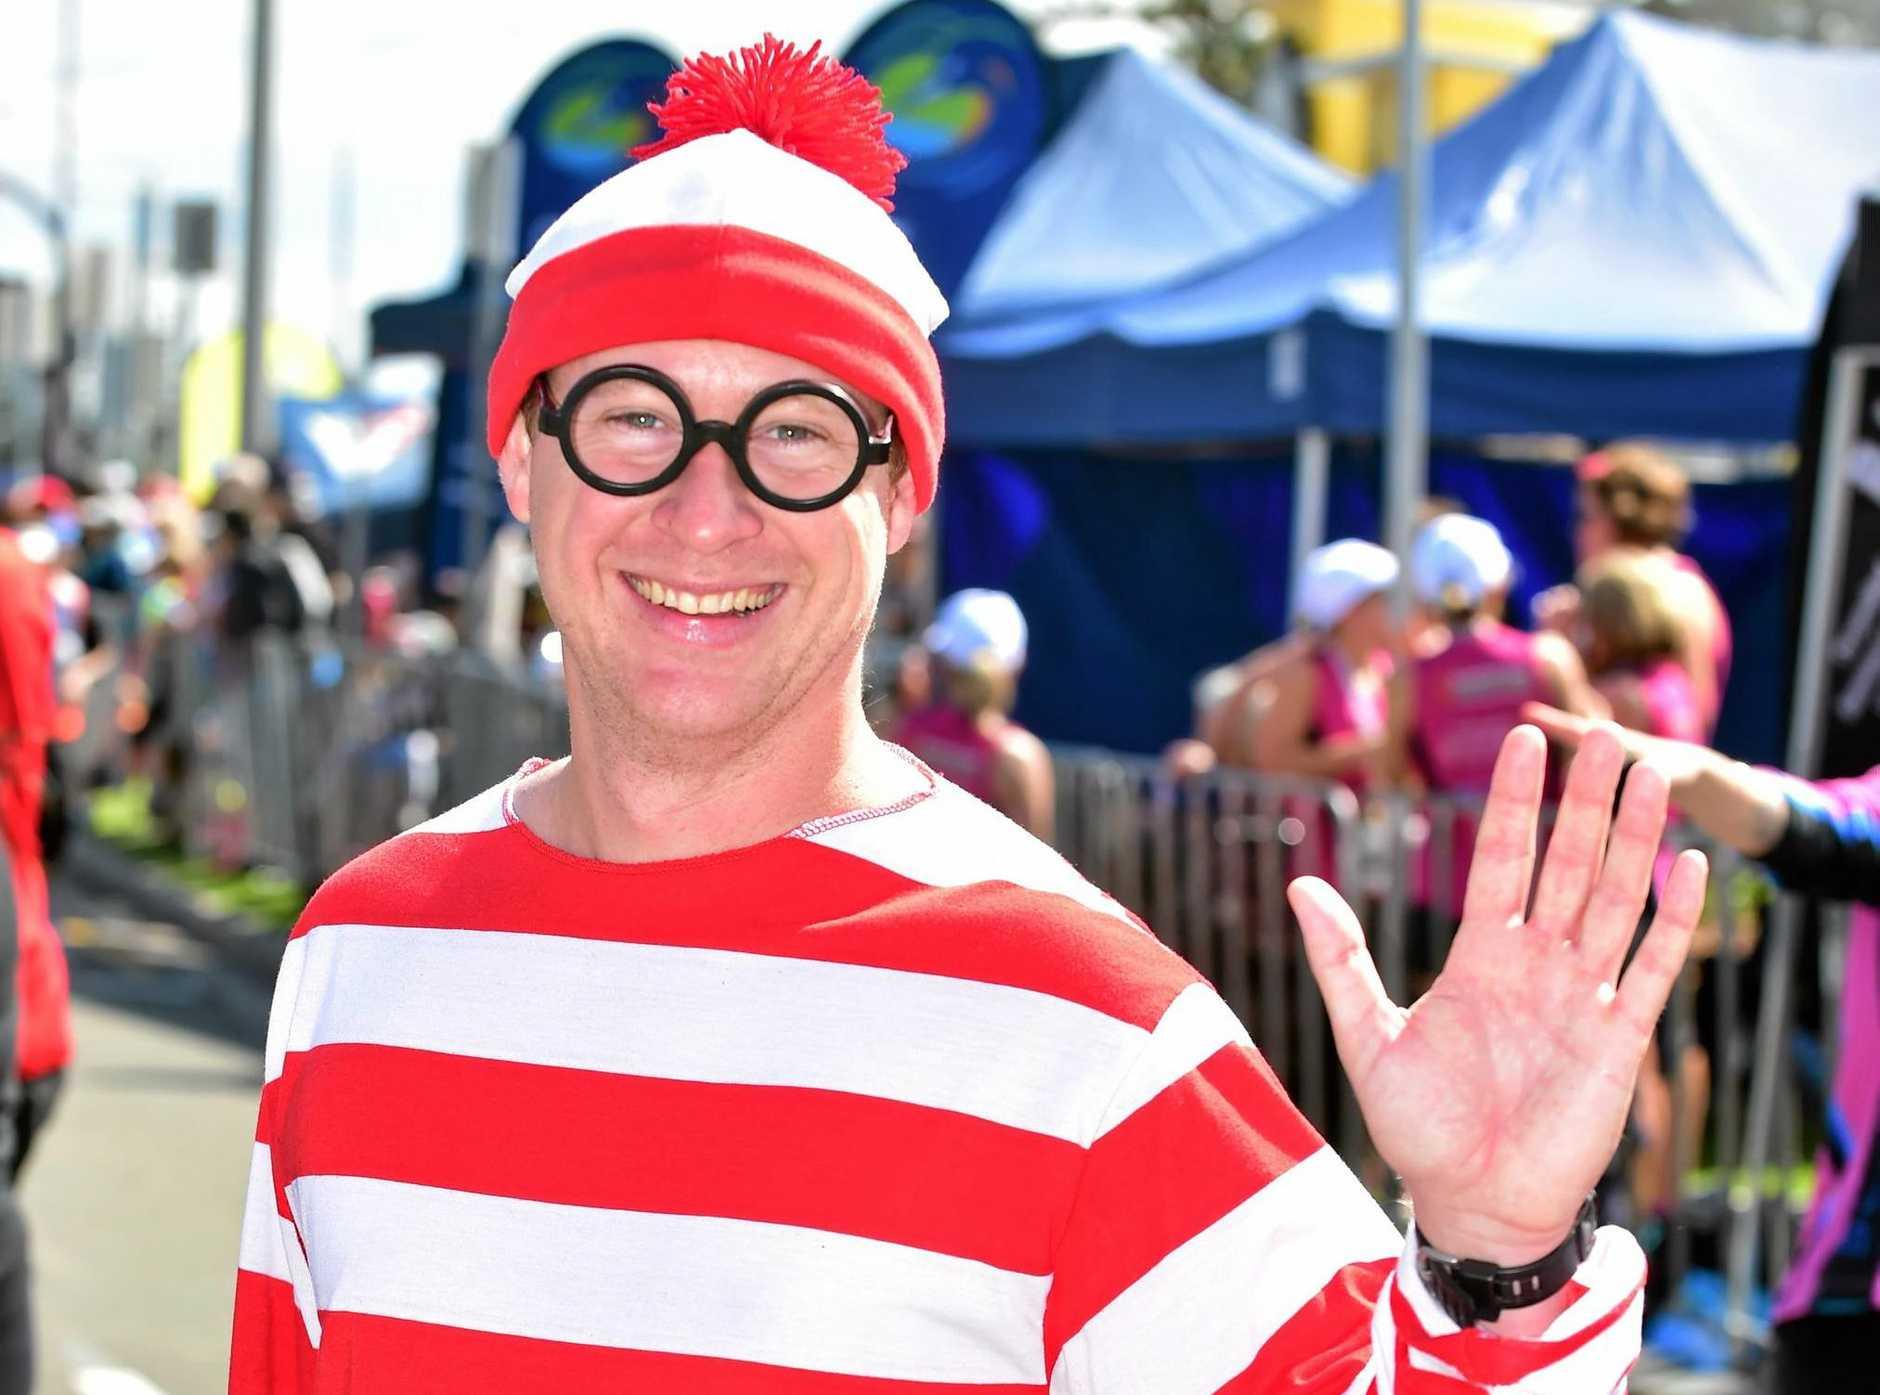 EASY TO FIND: Between 100-150 runners will kick-start the 7 Sunshine Cosat Marathon festivities with the Cricks Fun Run at Alexandra Headland this evening.